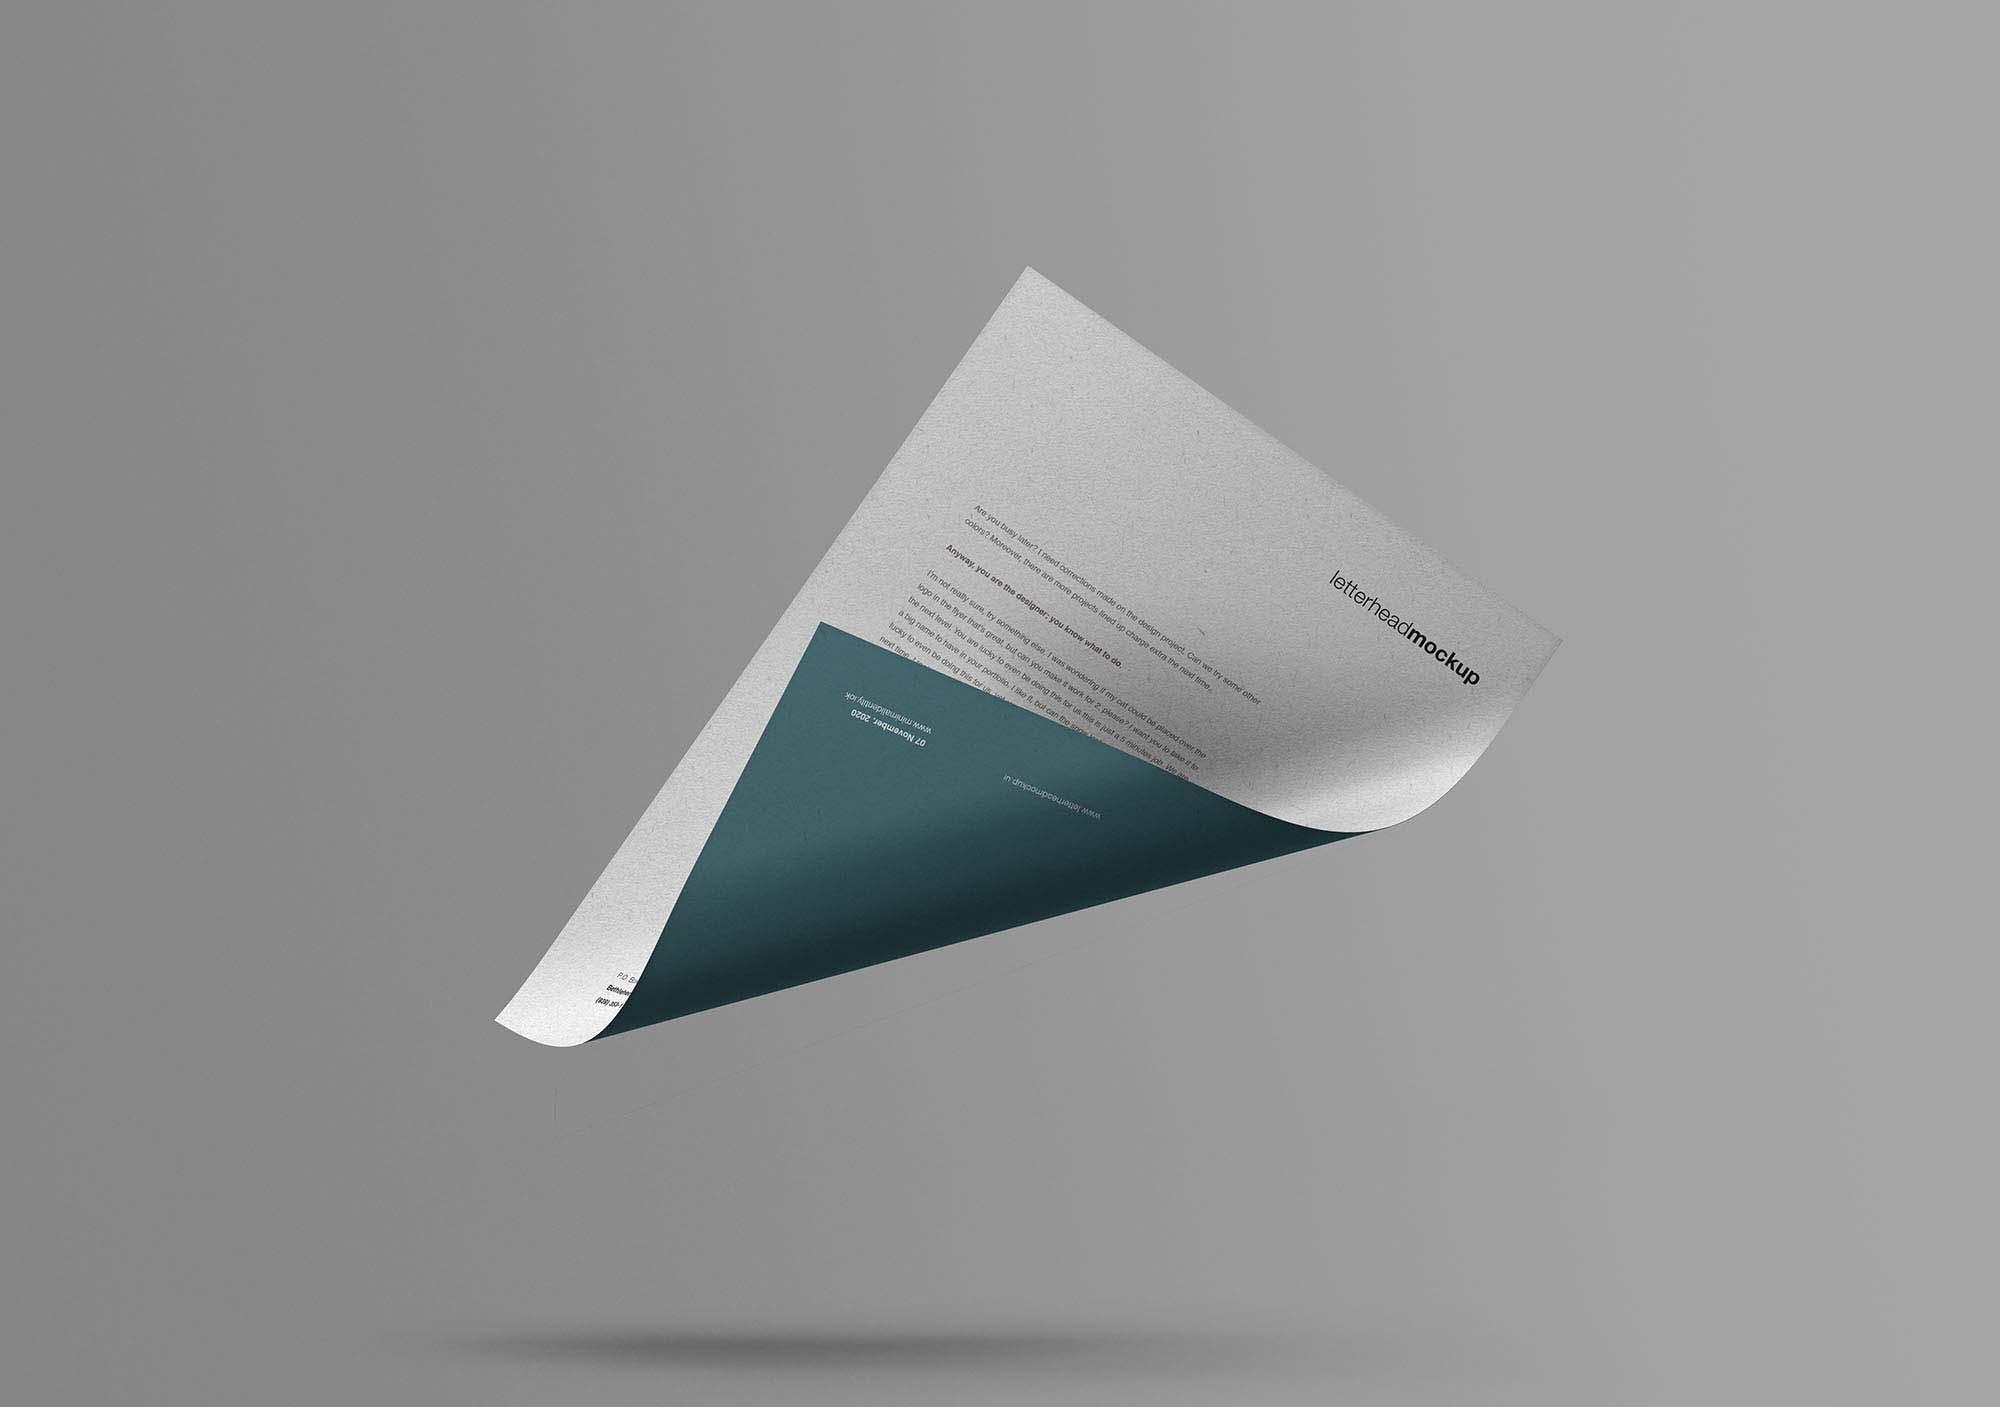 Floating A4 Paper Mockup